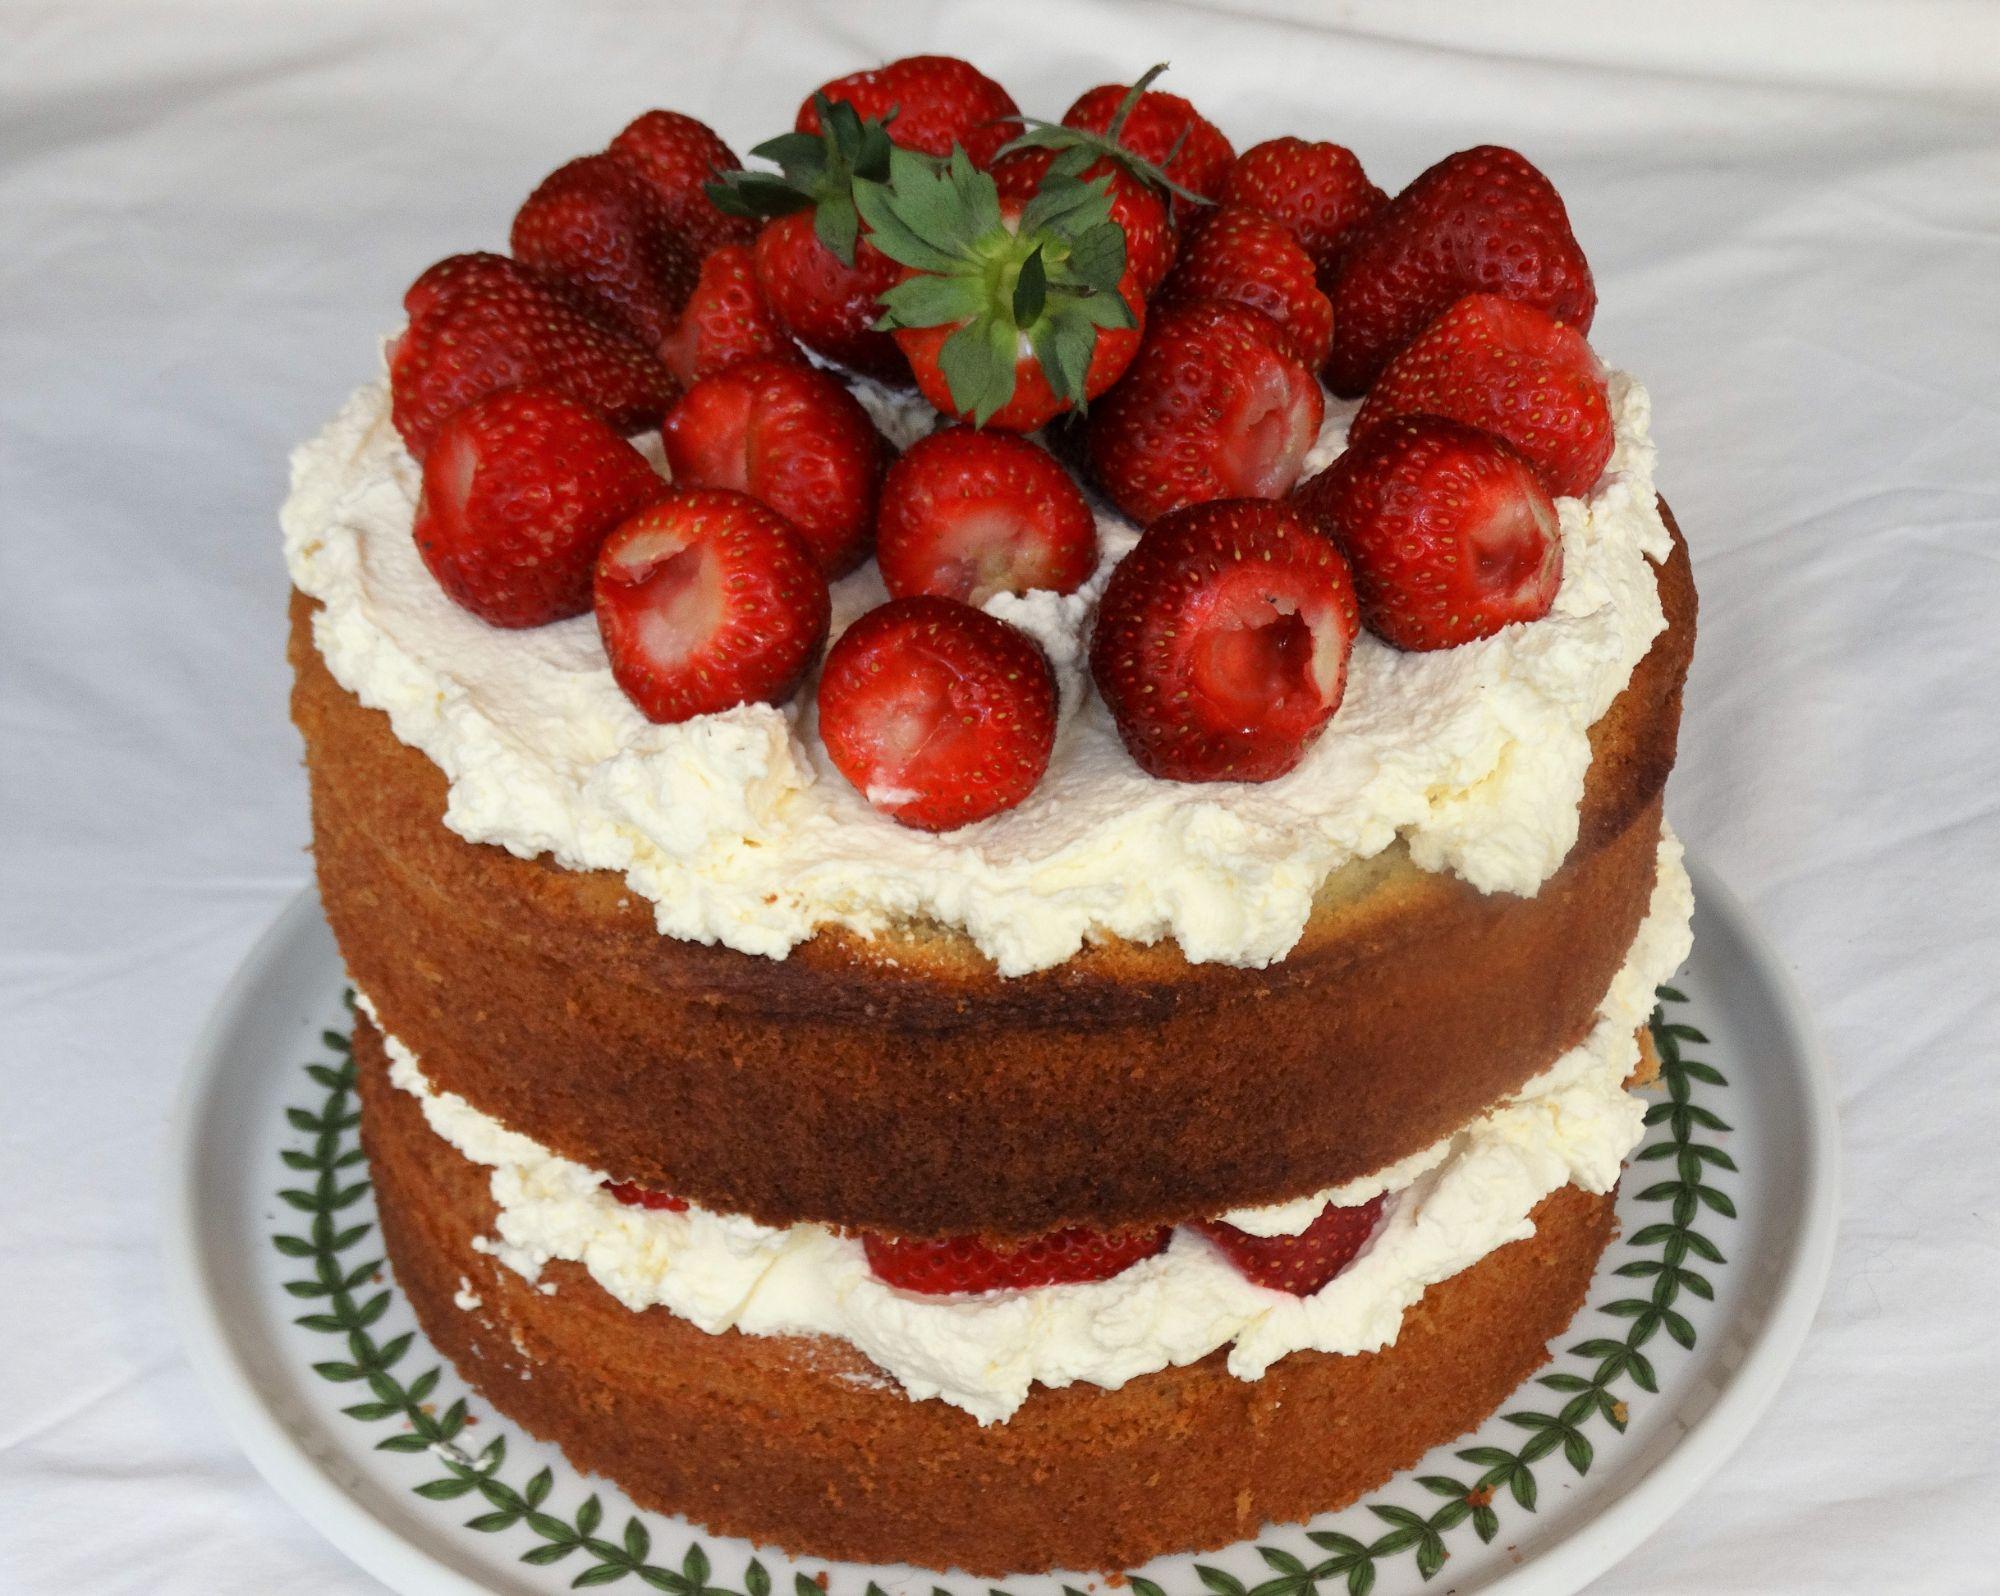 Strawberry and Whipped Cream Sponge Cake